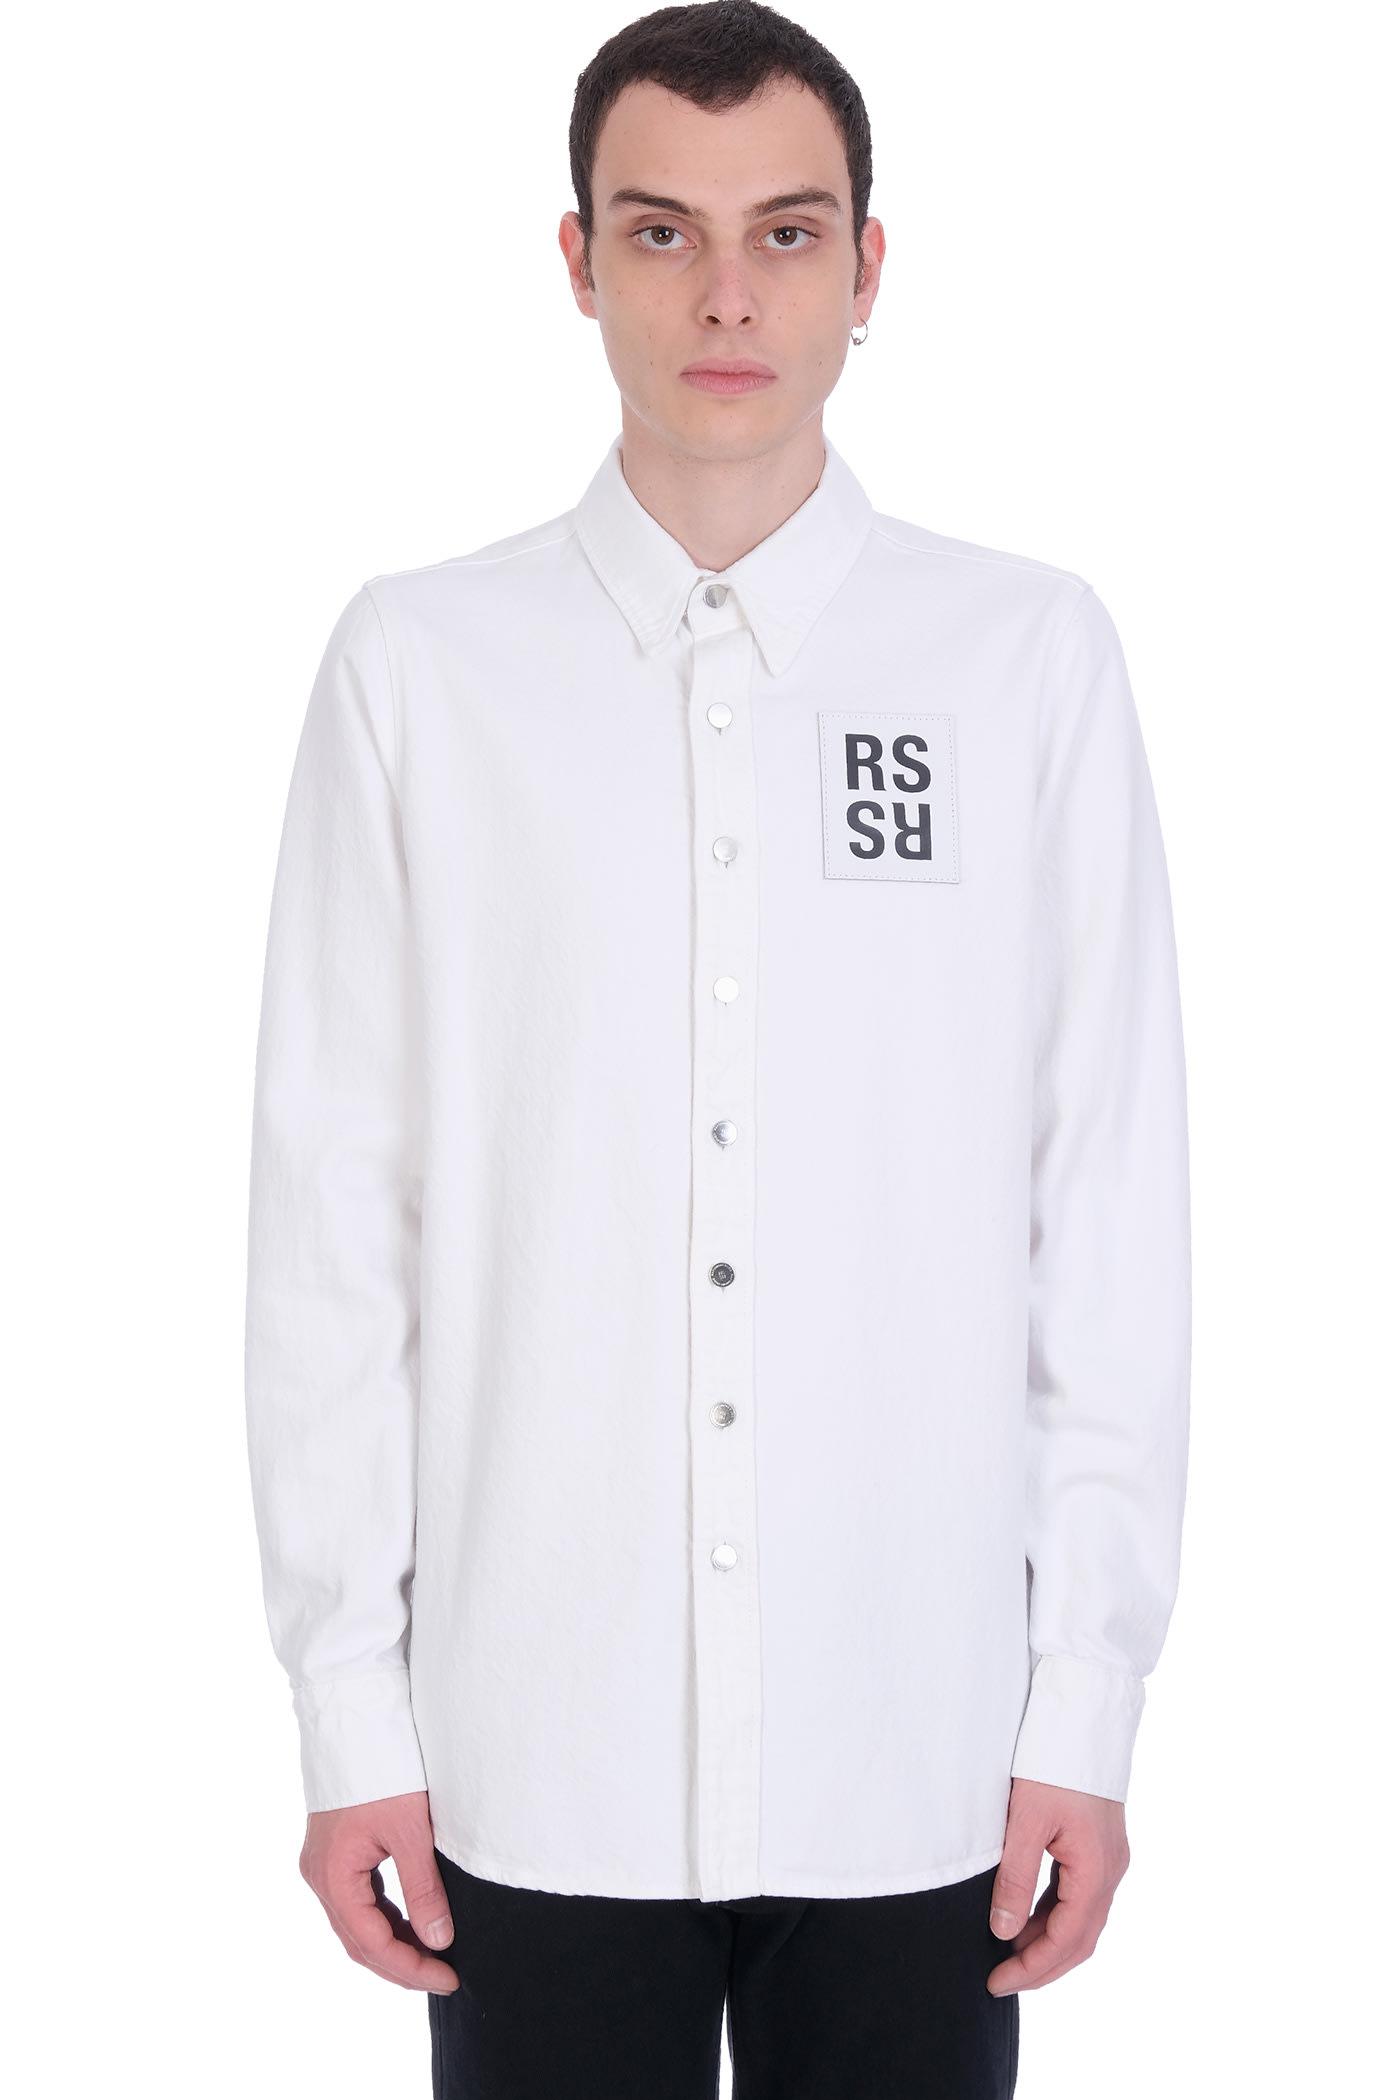 Raf Simons Shirt In White Denim